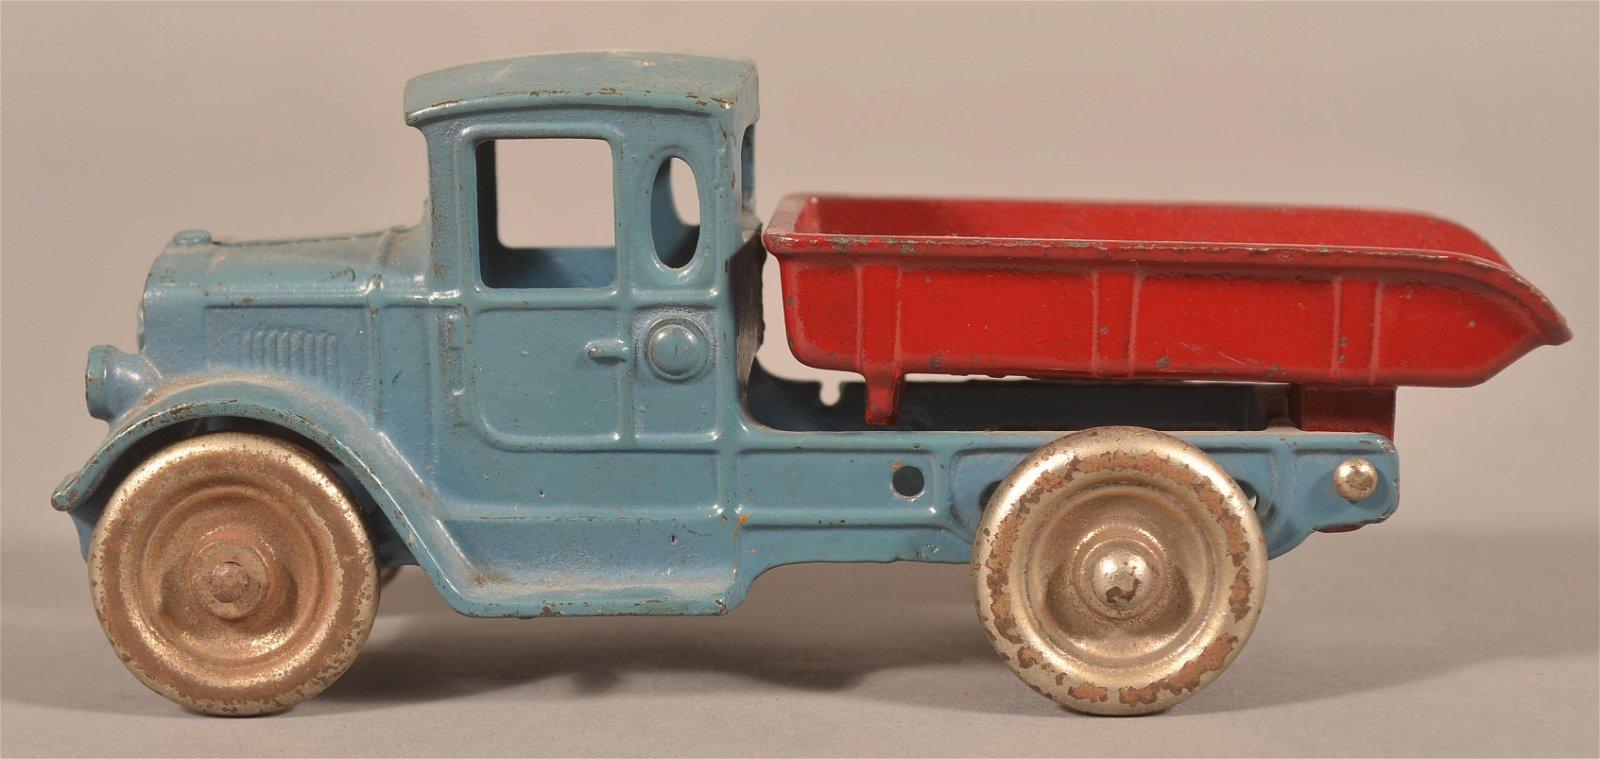 Kilgore Cast Iron Dump Truck, Circa. 1934.